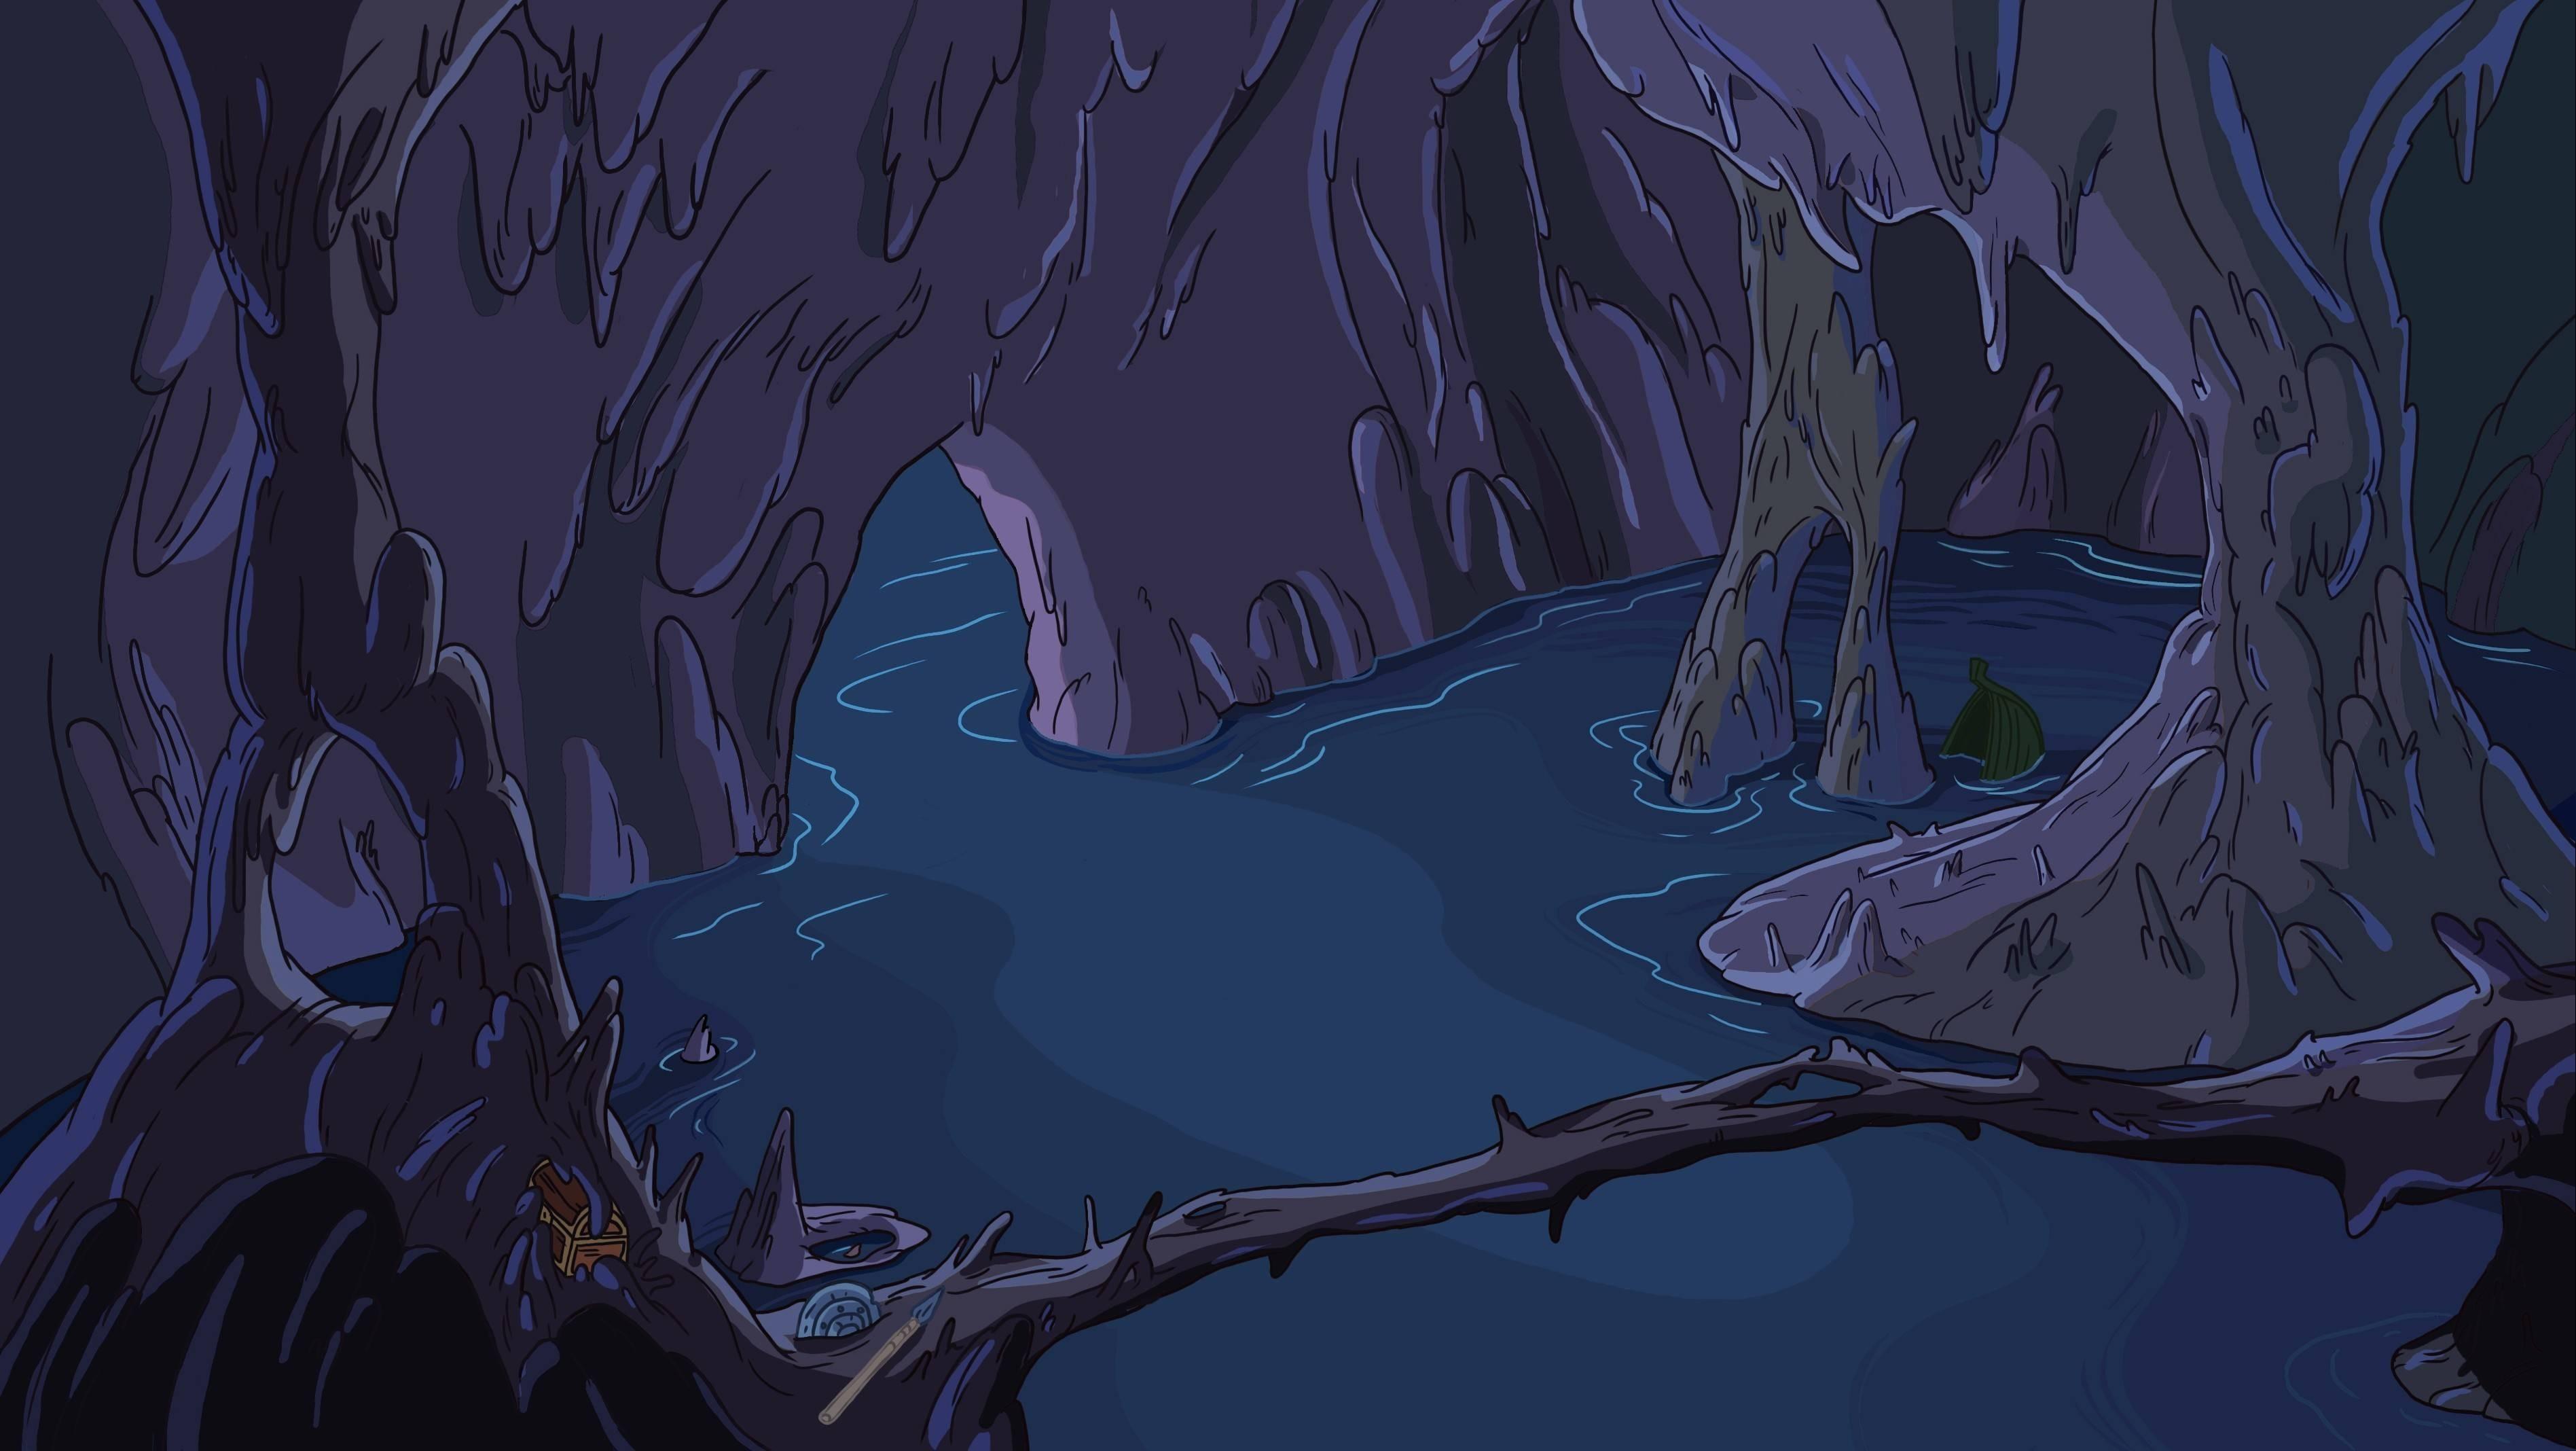 Great Wallpaper Night Cartoon - illustration-night-anime-water-space-sky-purple-Earth-branch-cartoon-world-atmosphere-Adventure-Time-midnight-ART-tree-darkness-screenshot-computer-wallpaper-fictional-character-special-effects-fiction-ecosystem-biome-organism-phenomenon-3793x2136-px-visual-arts-cg-artwork-visual-effects-847789  Photograph.jpg